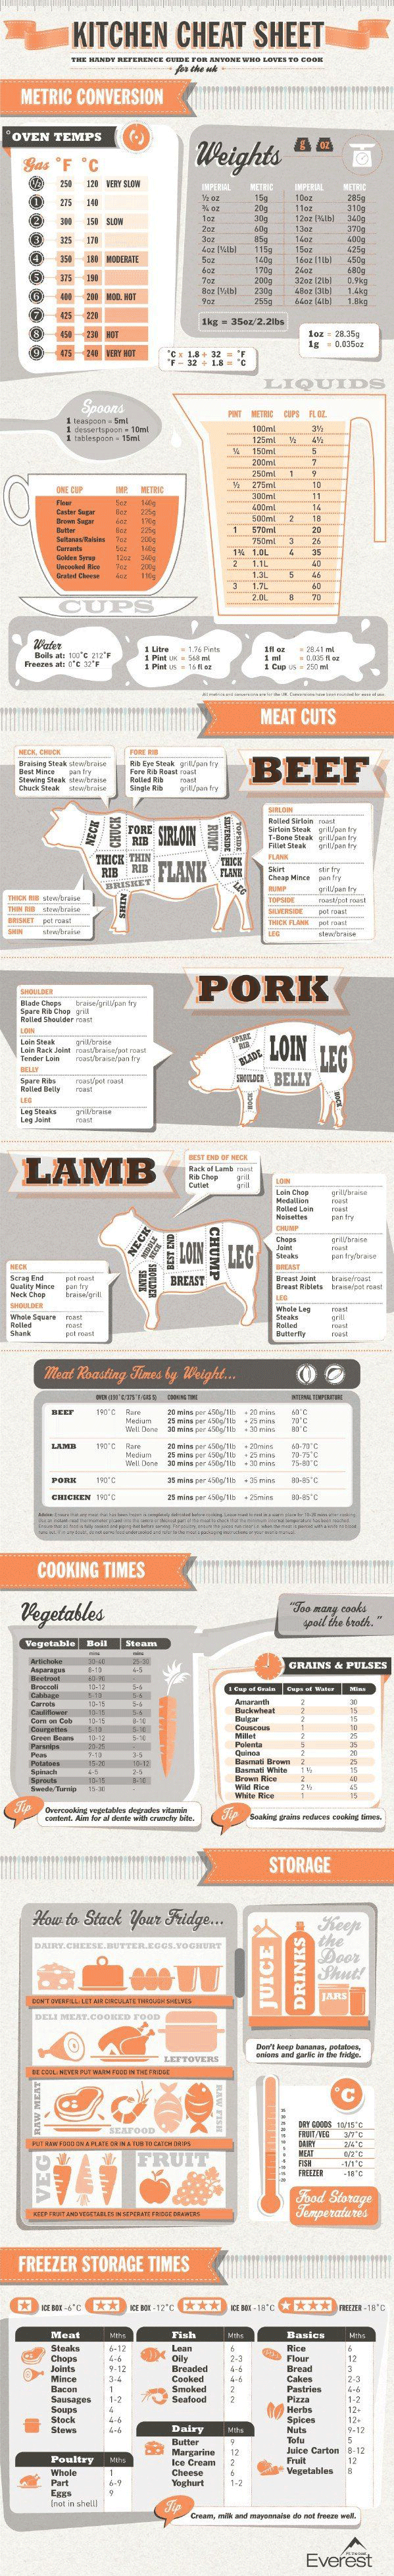 Infographic Keuken spiekbriefje